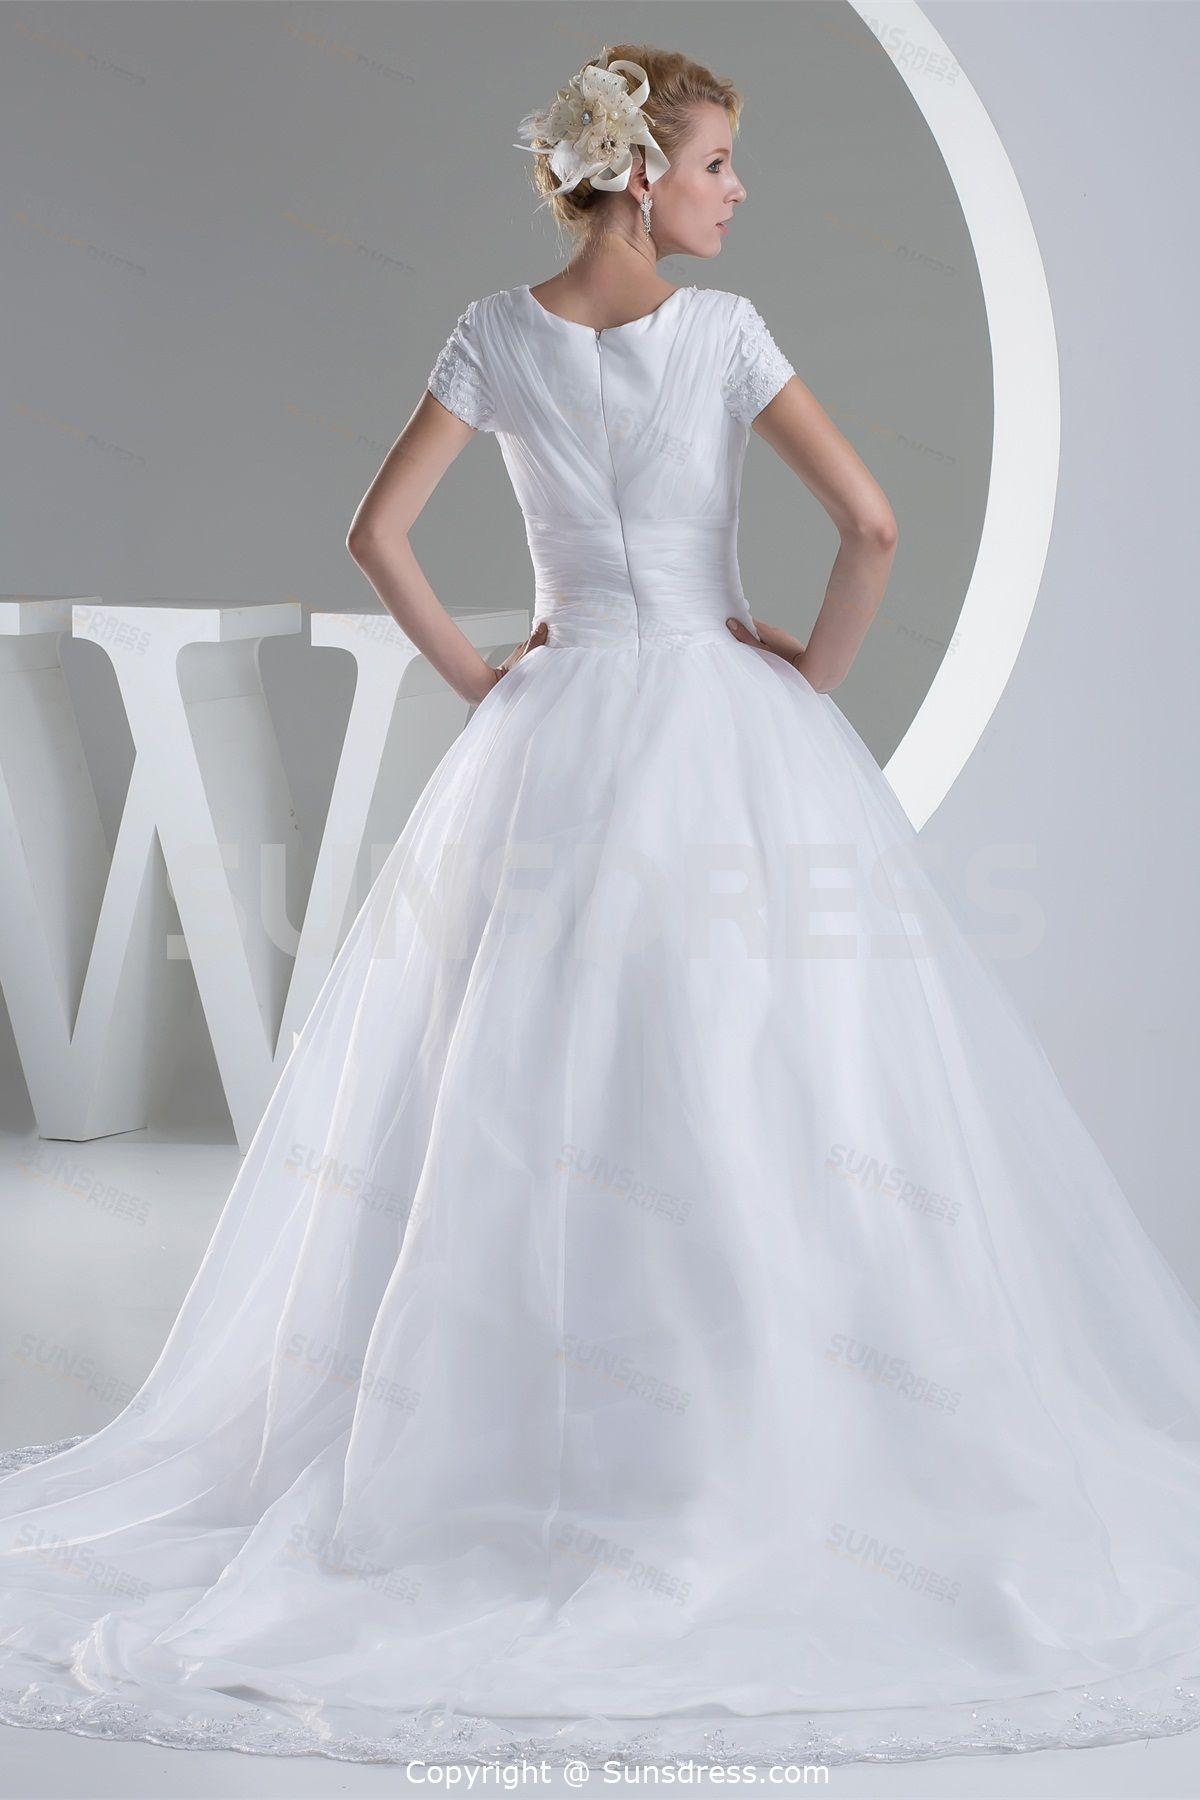 Contemporary Themed Wedding Dresses Sketch - The Wedding Ideas ...